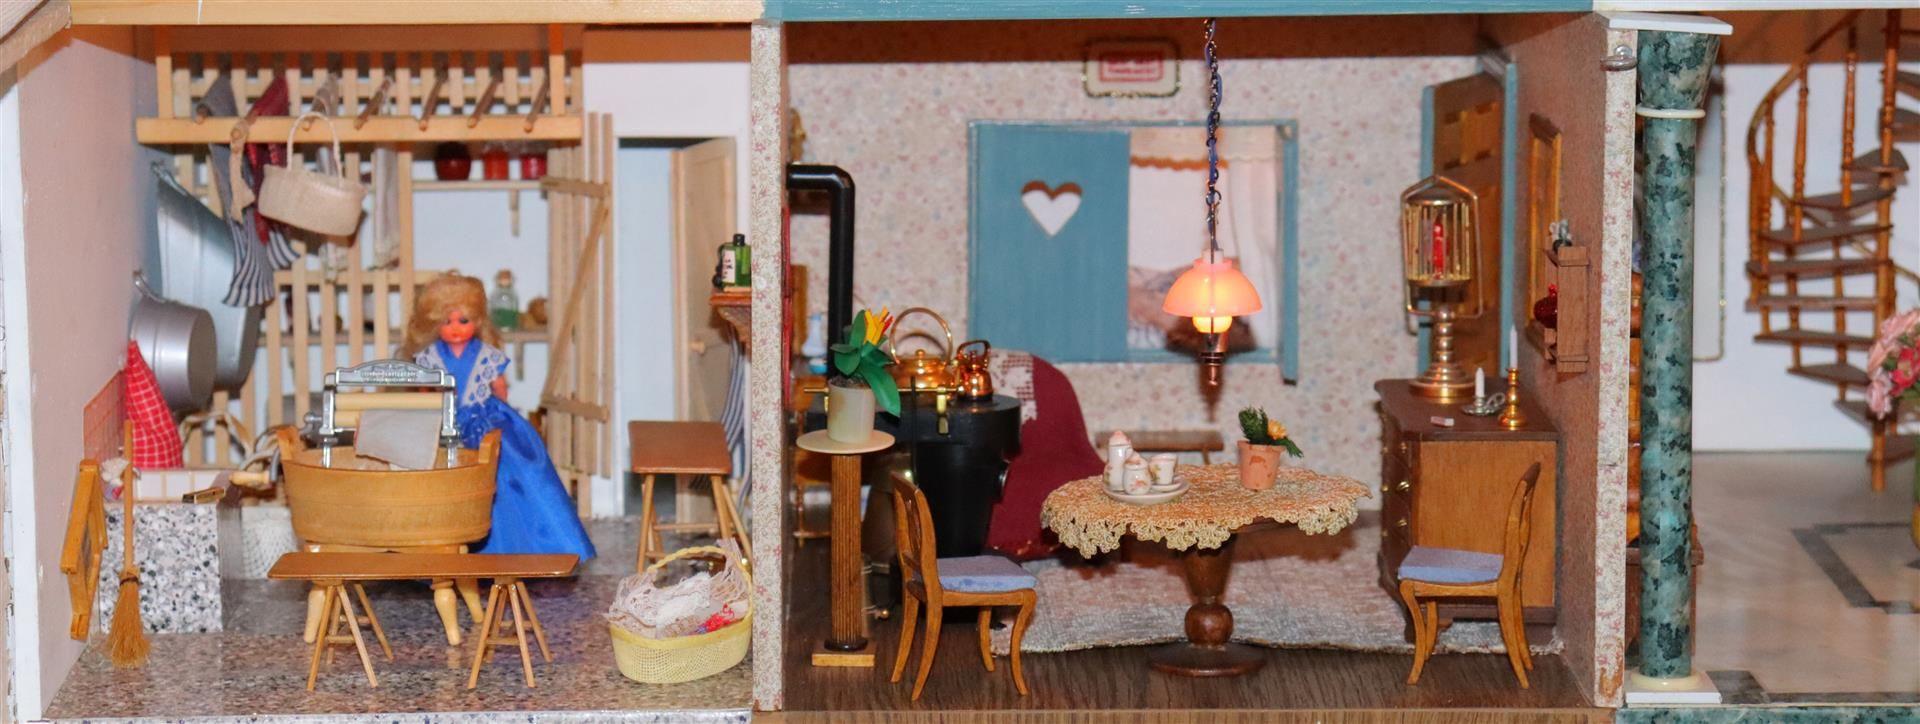 Dollhouse De Kettenborgh by Mrs. J C Wirix Kettenborg - Image 31 of 106